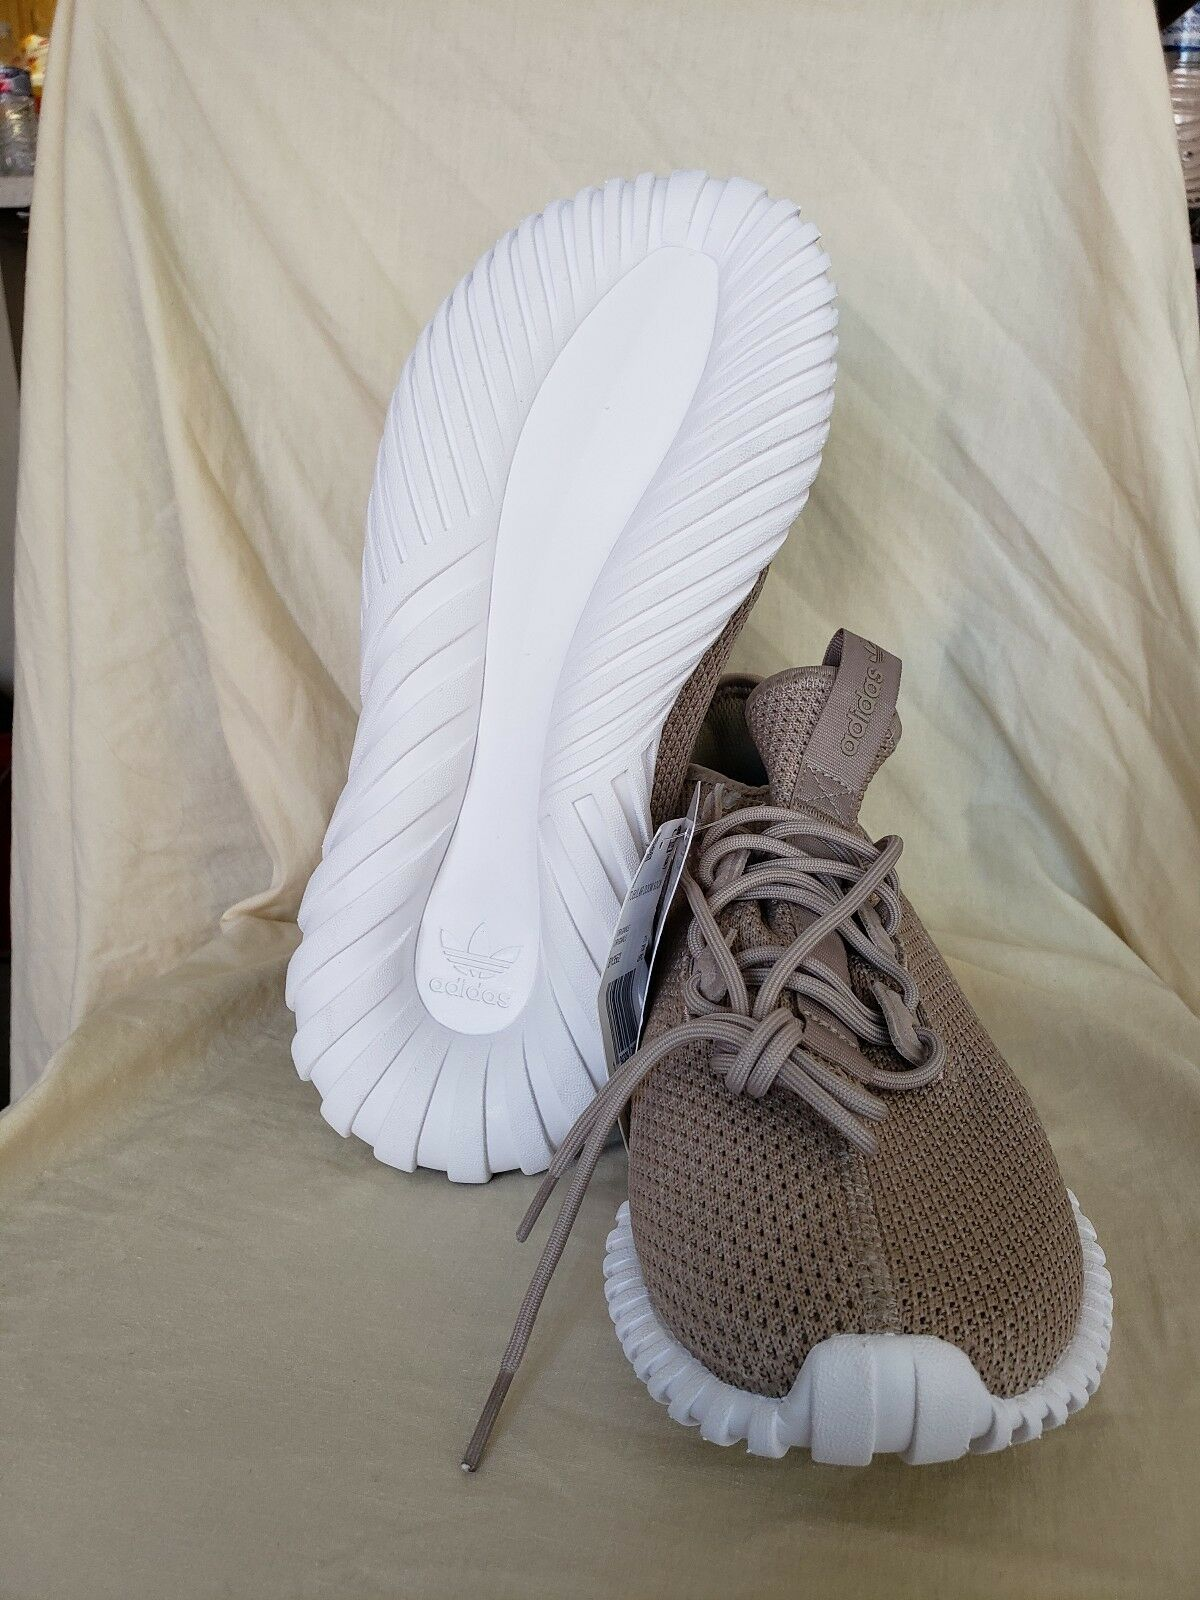 best service 14728 d048d Adidas Originals Khaki BY3562 White Crystal Trace Primeknit ...